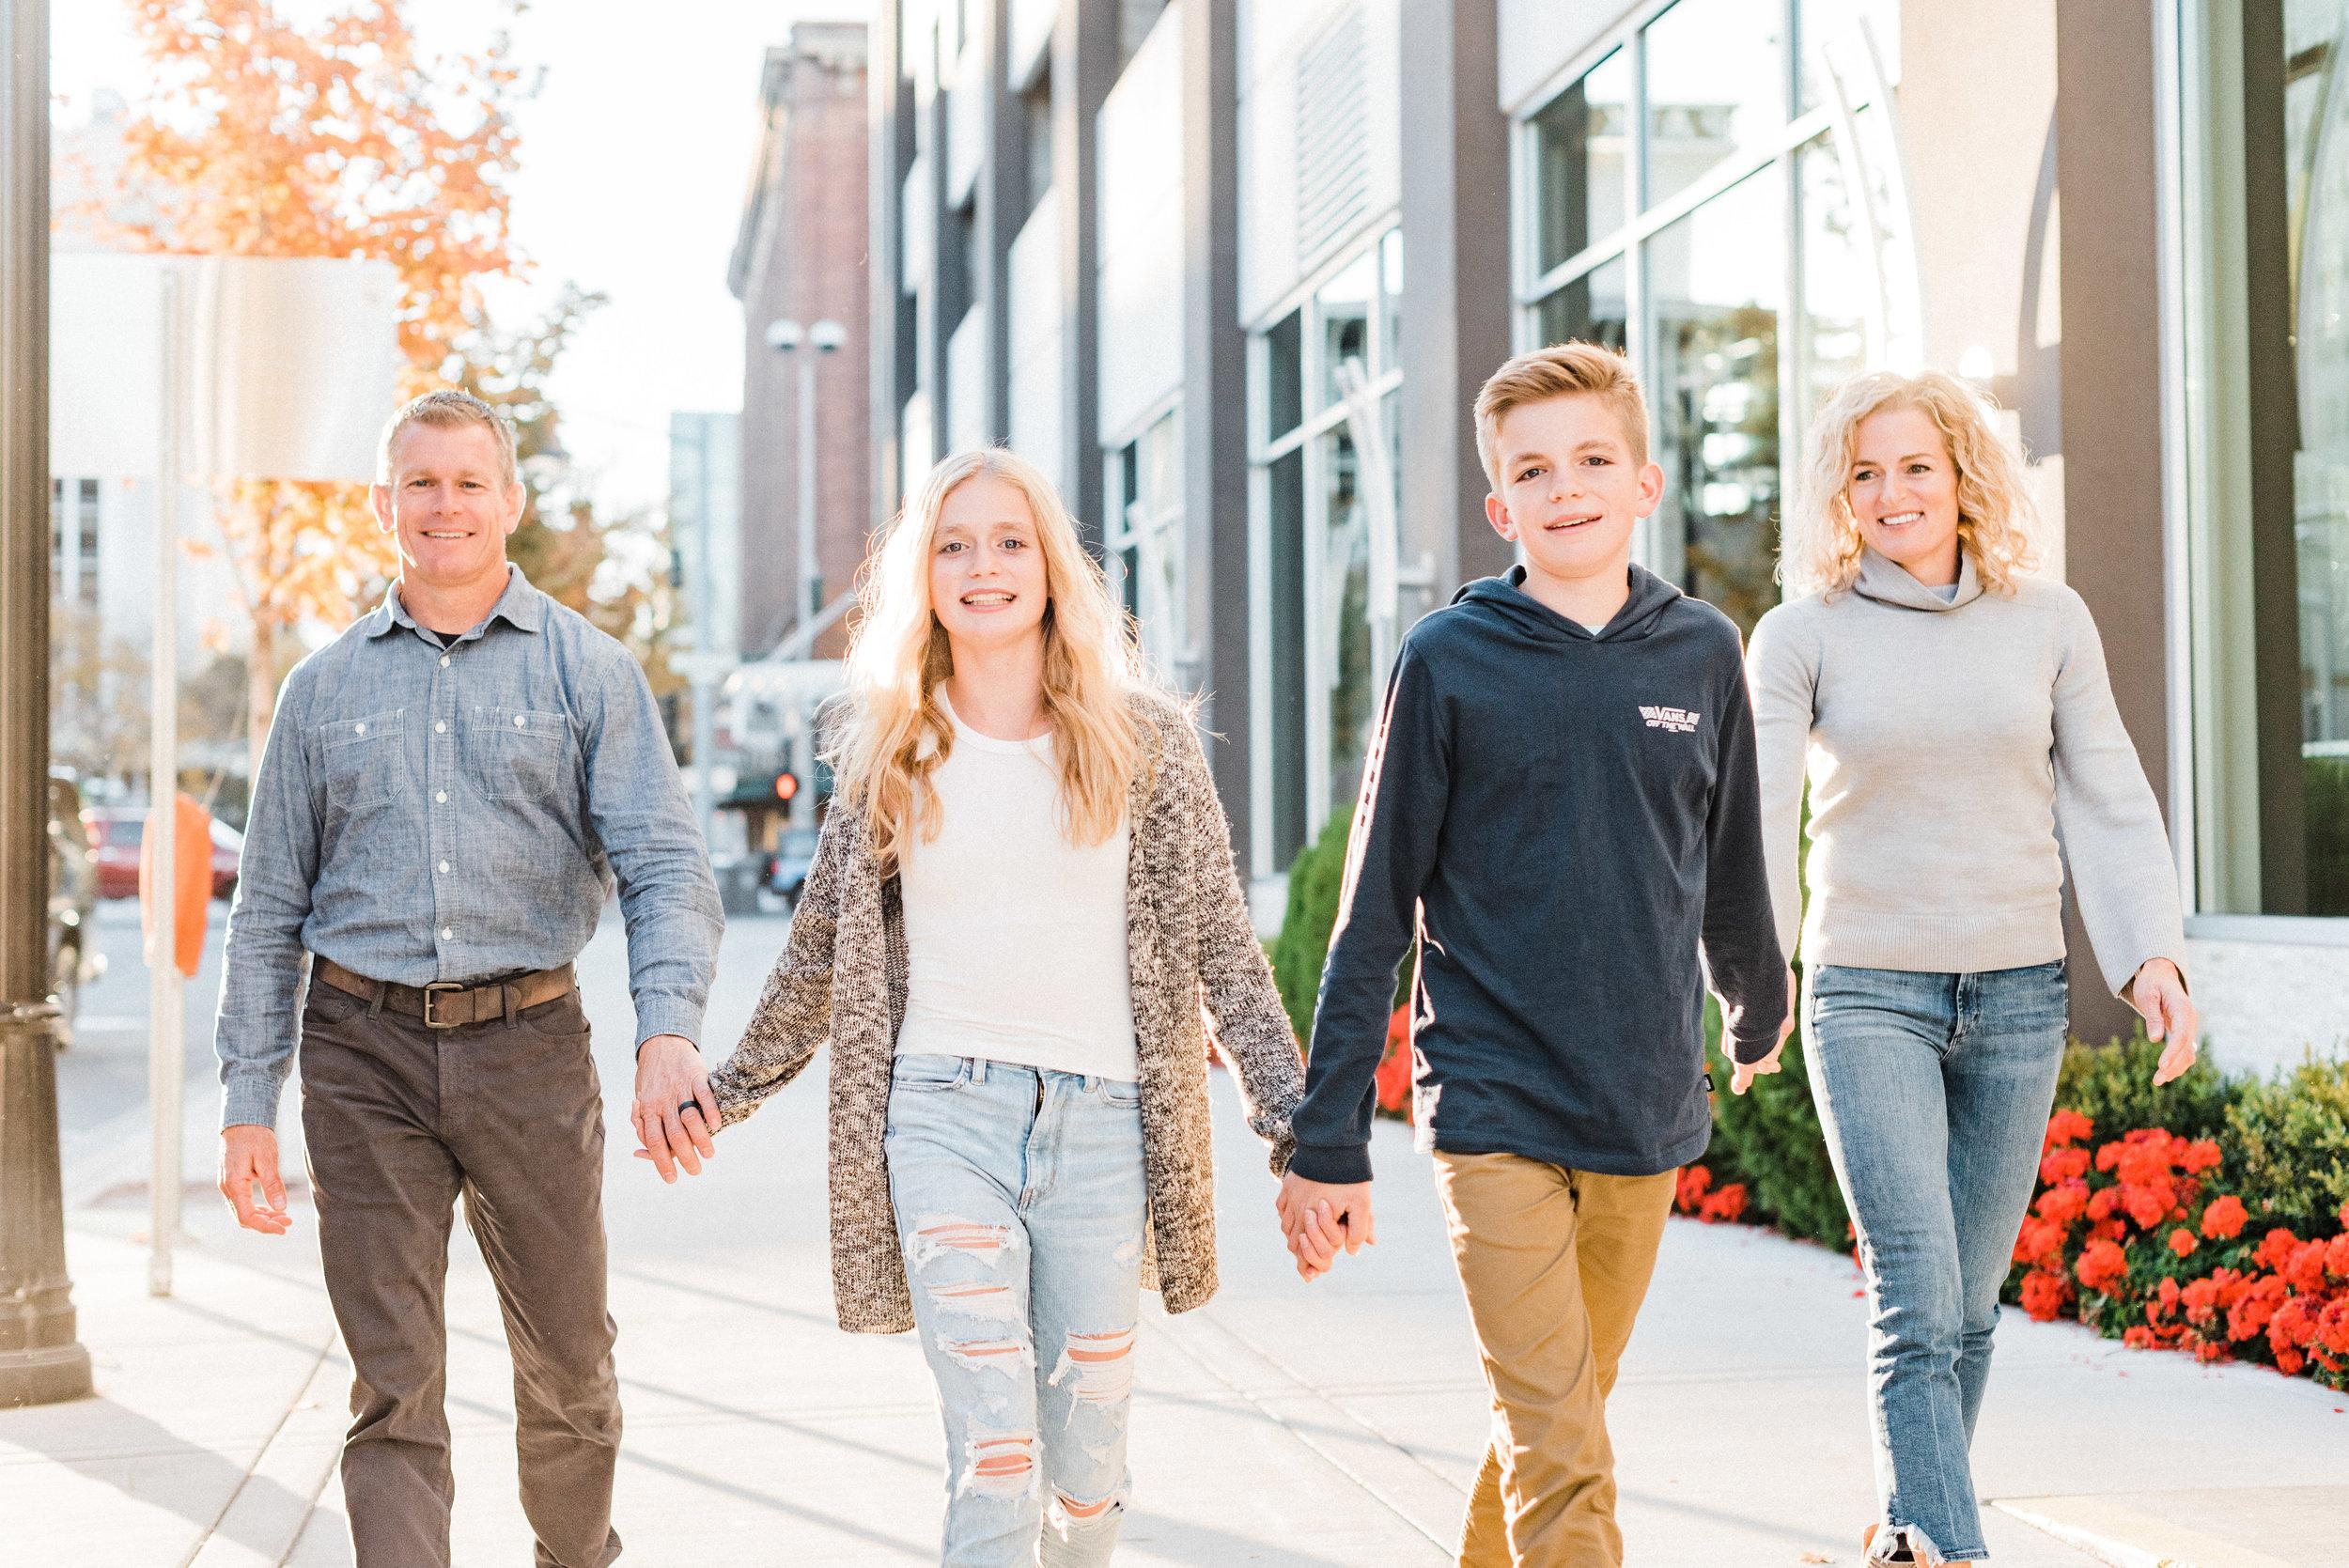 fall-family-session-spokane-wa-cardon (2 of 30).jpg